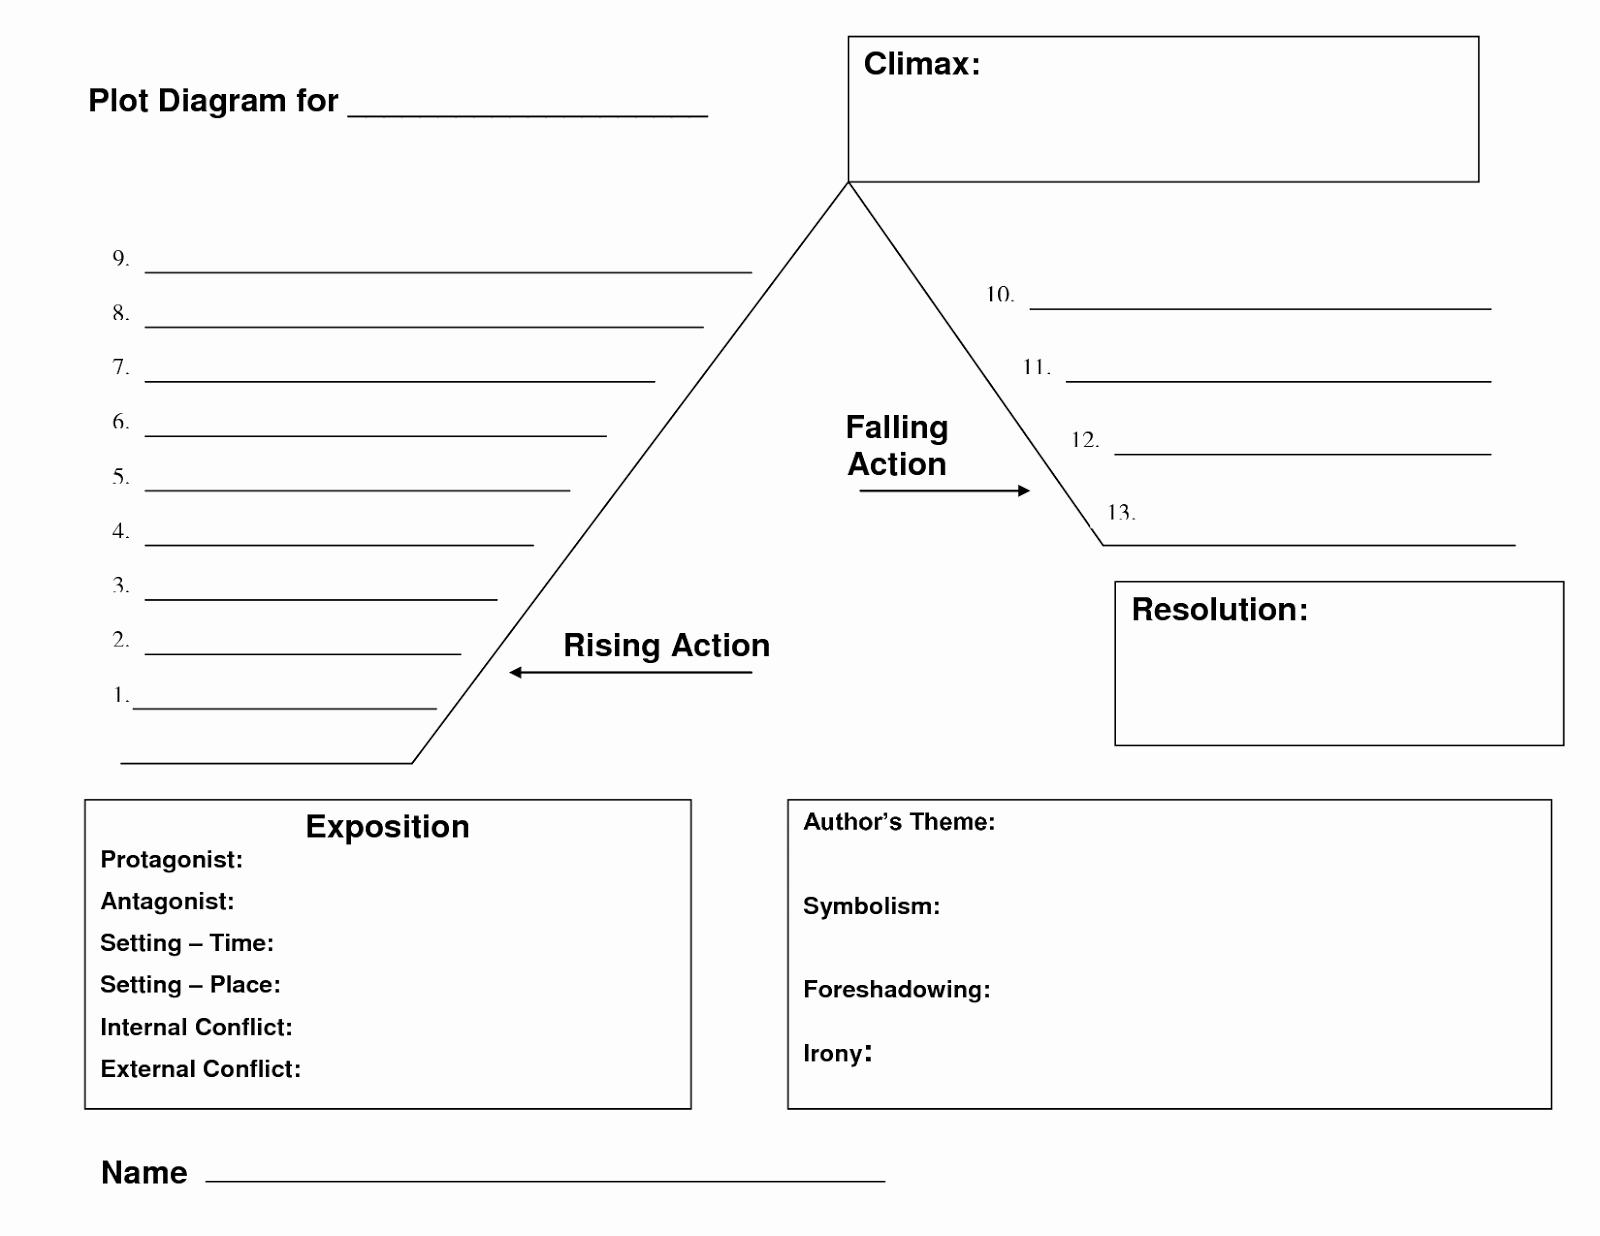 Plot Diagram Worksheet Pdf Luxury Di Croce St Simon Dec 18 Novel Study Plot Diagram Prezi